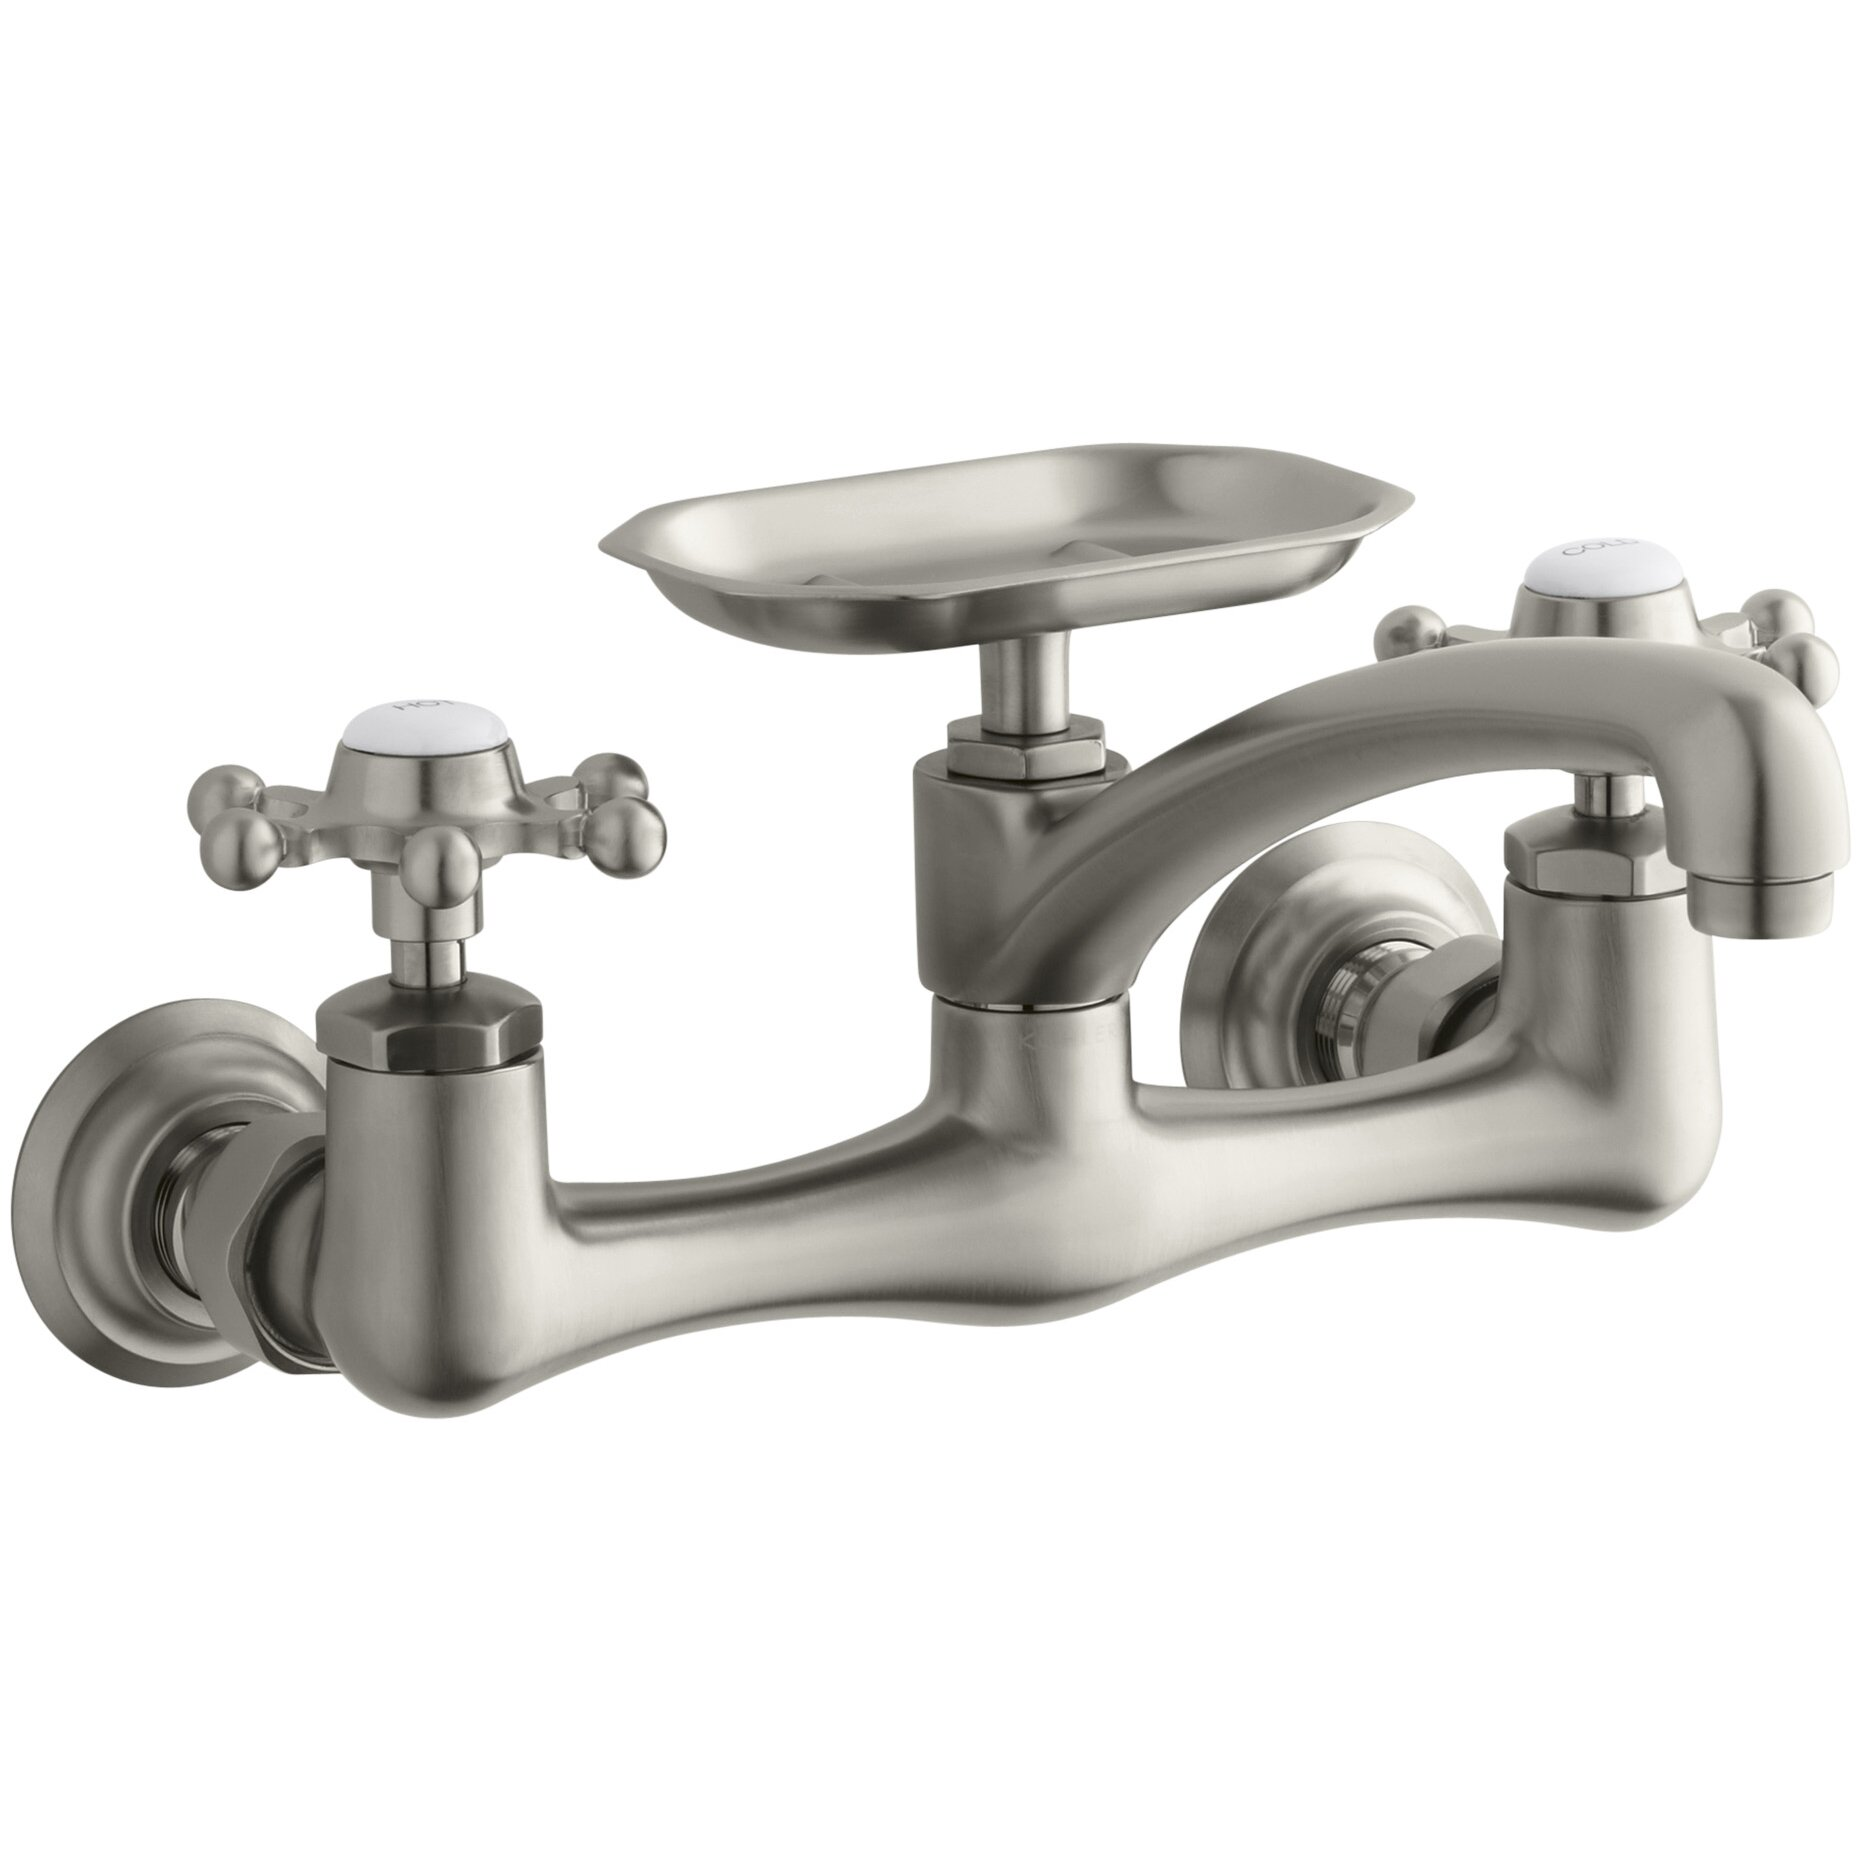 Kohler Antique Kitchen Faucet: Antique Two-Hole Wall-Mount Kitchen Sink Faucet With 8